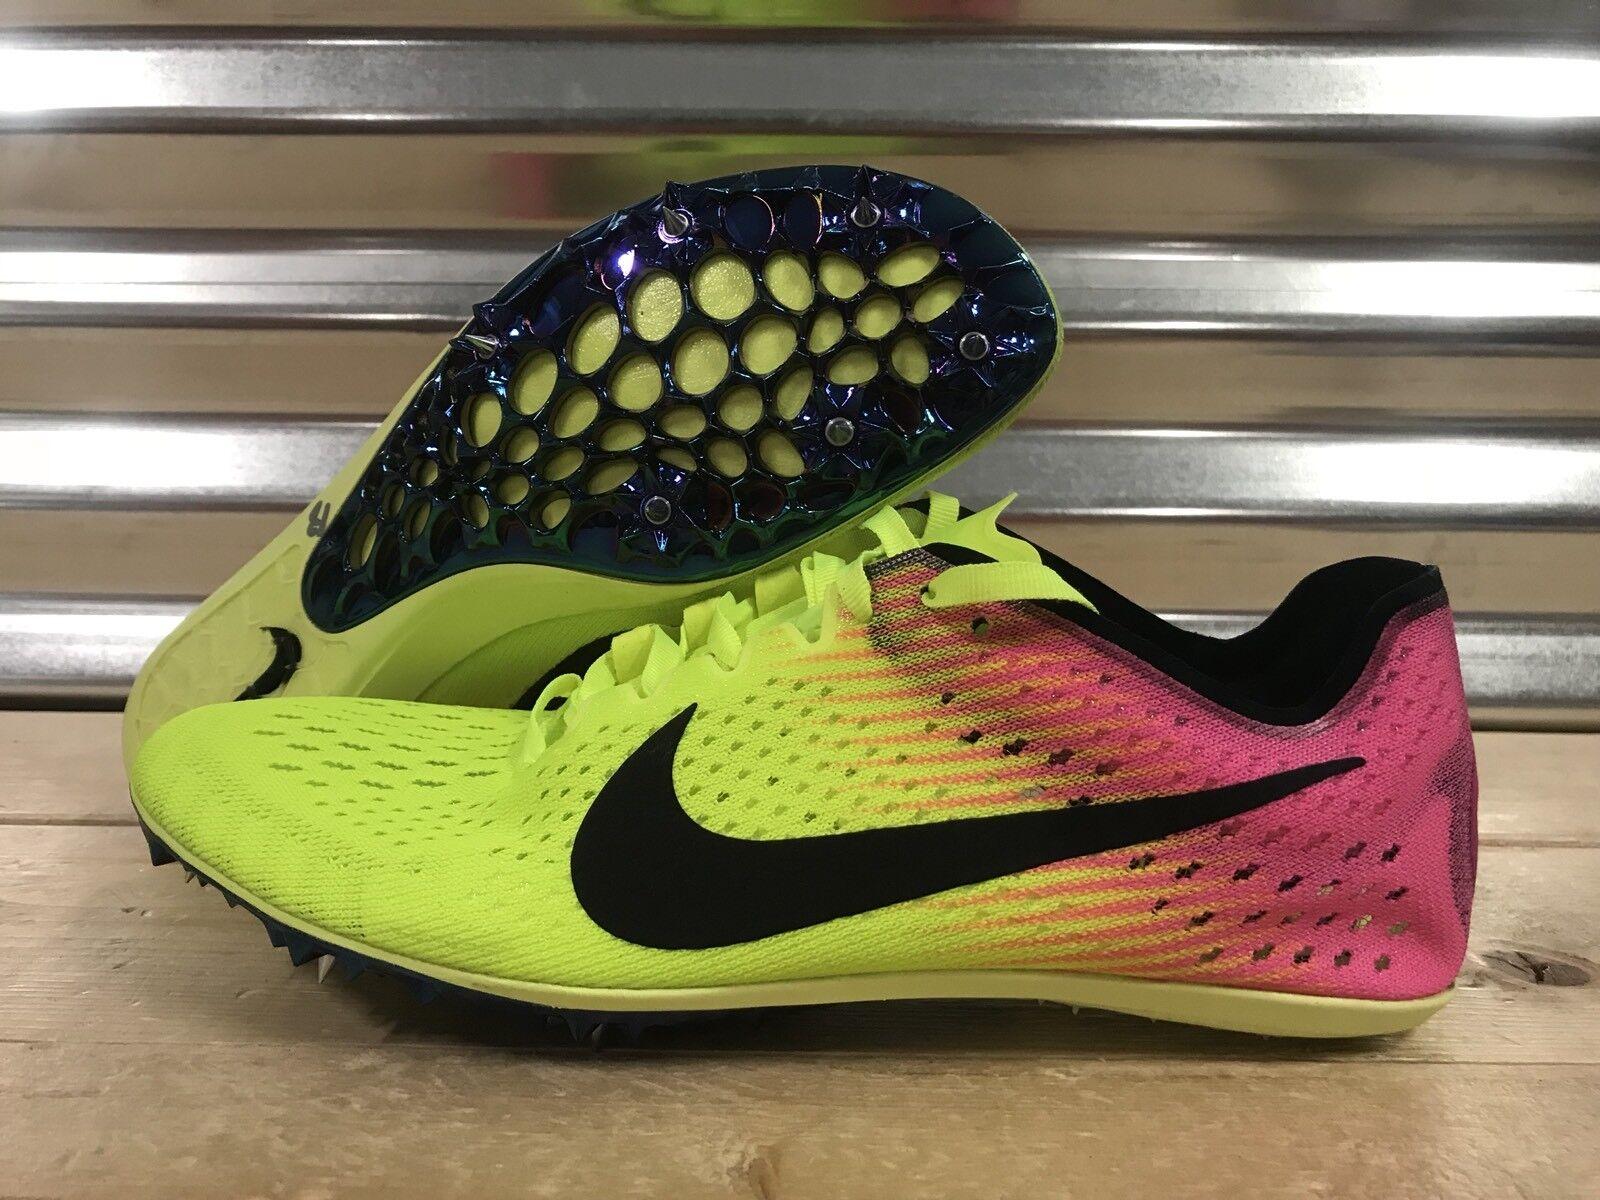 Nike zoom vittoria elite 2 binari spuntoni volt rosa nero rio sz (835998-999)